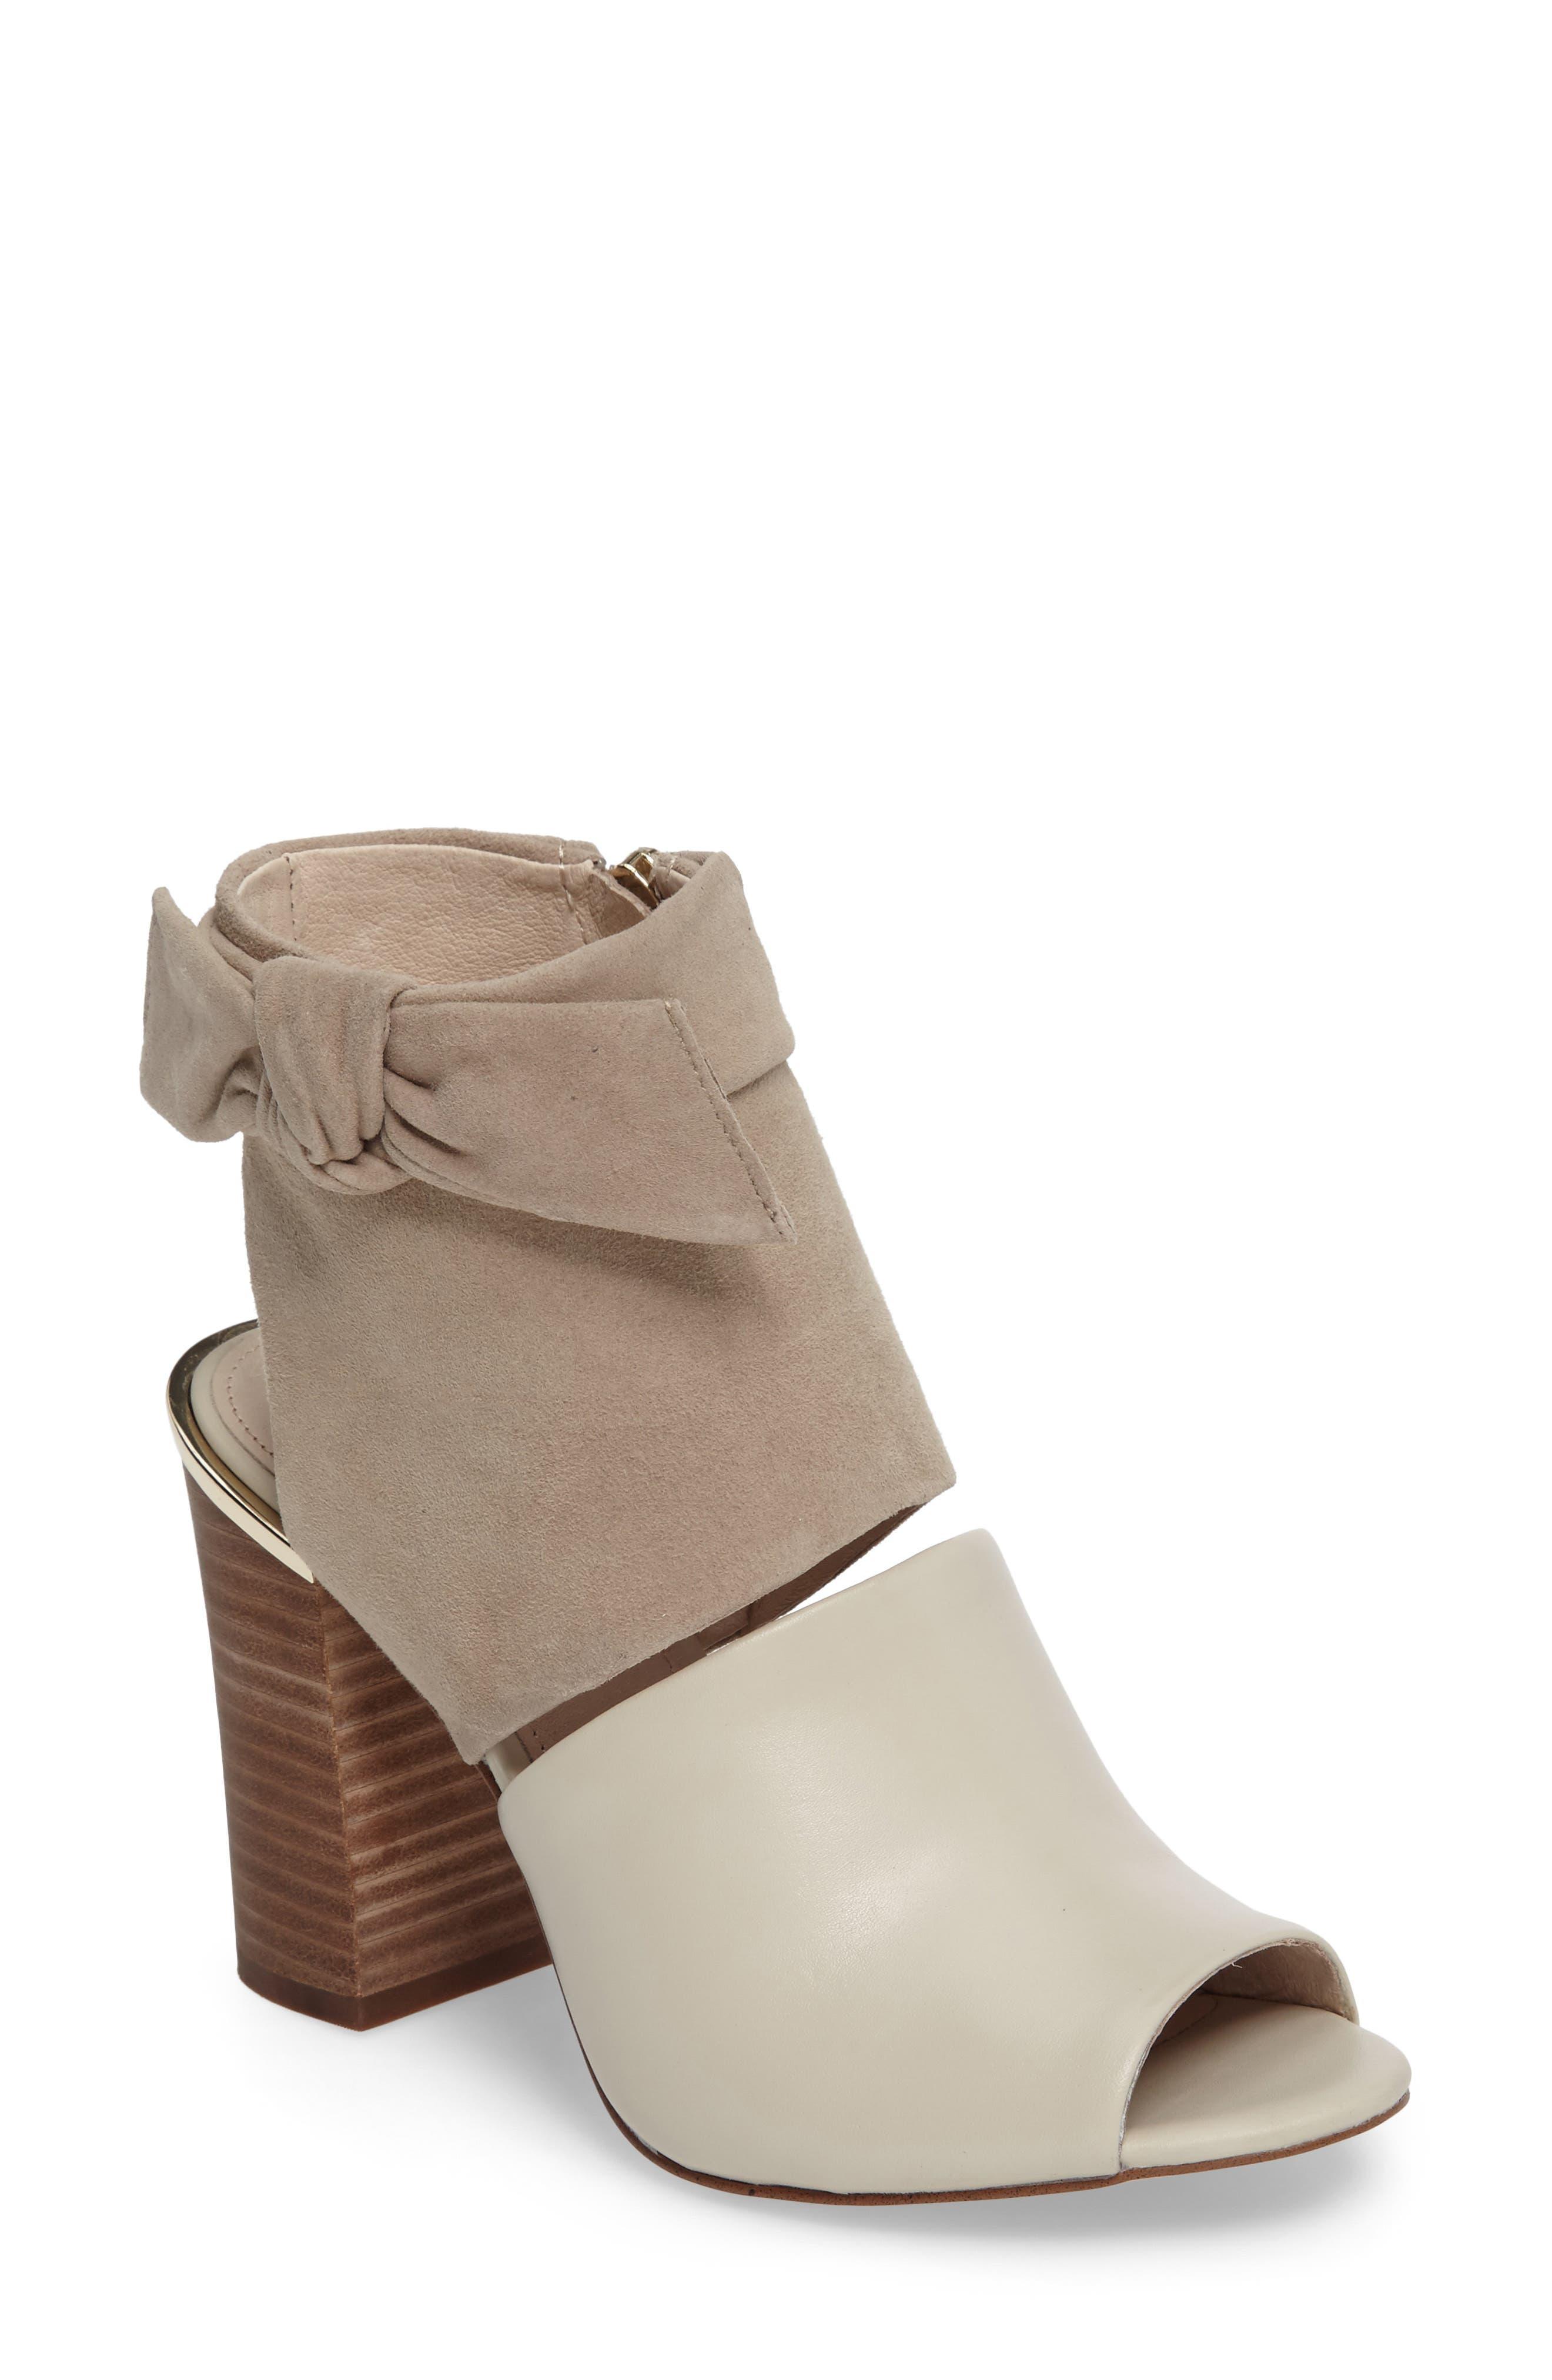 Alternate Image 1 Selected - Louise et Cit Katlin Block Heel Sandal (Women)